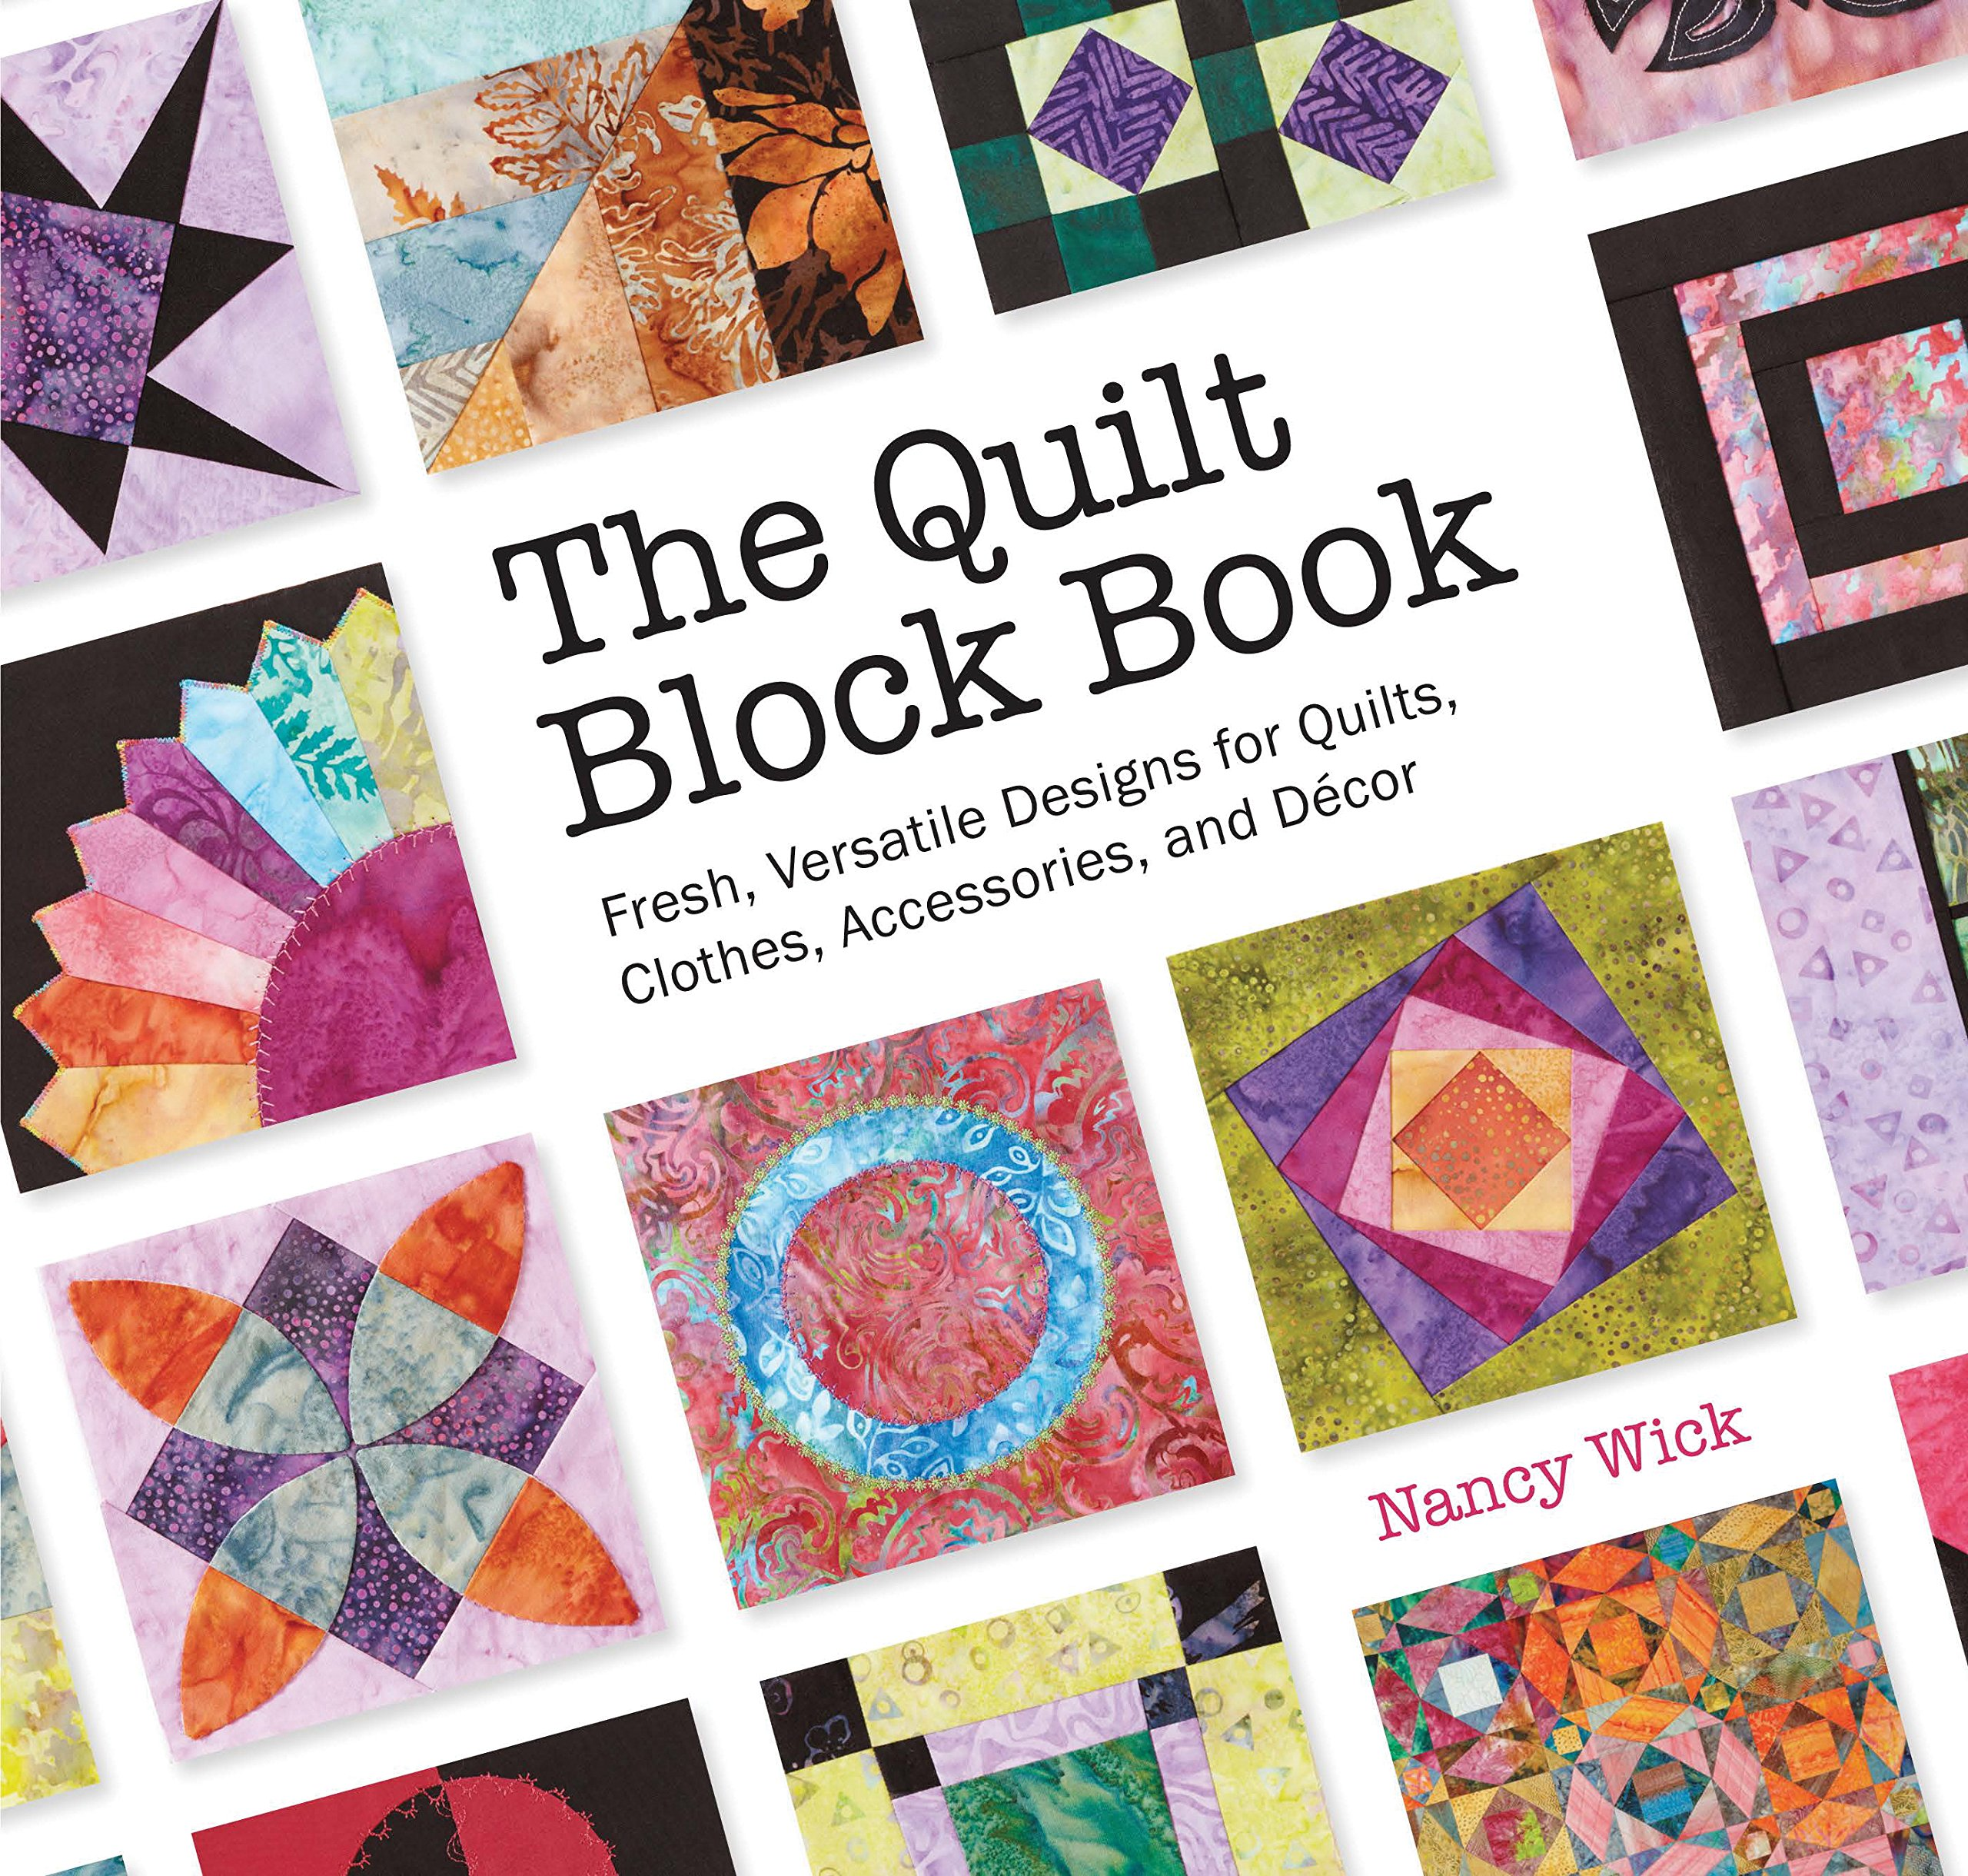 The Quilt Block Book: Fresh, Versatile Designs for Quilts, Clothes ... : quilt book - Adamdwight.com